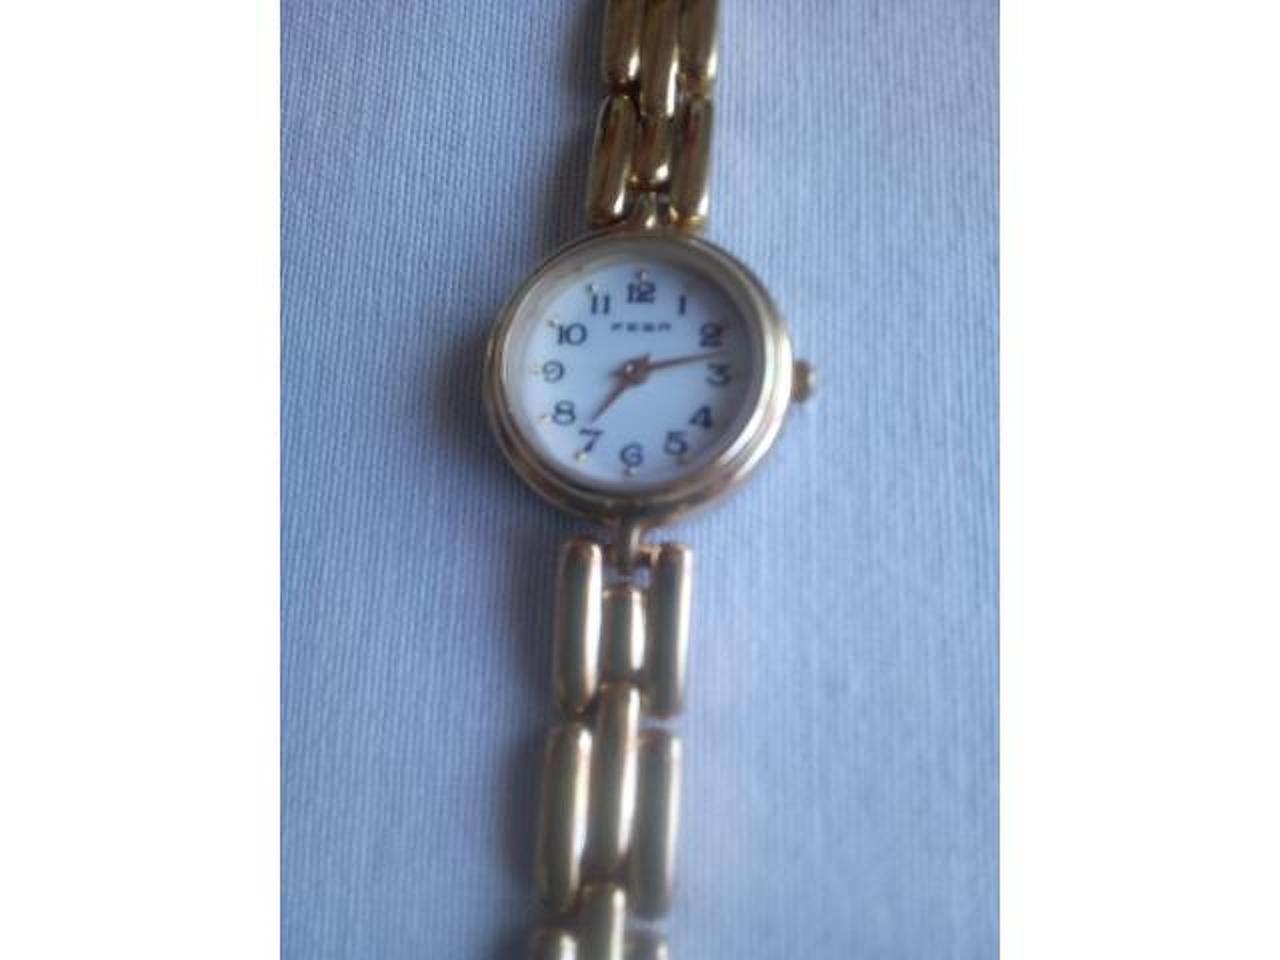 Relógio Fesa dourado, novo. - 2/4